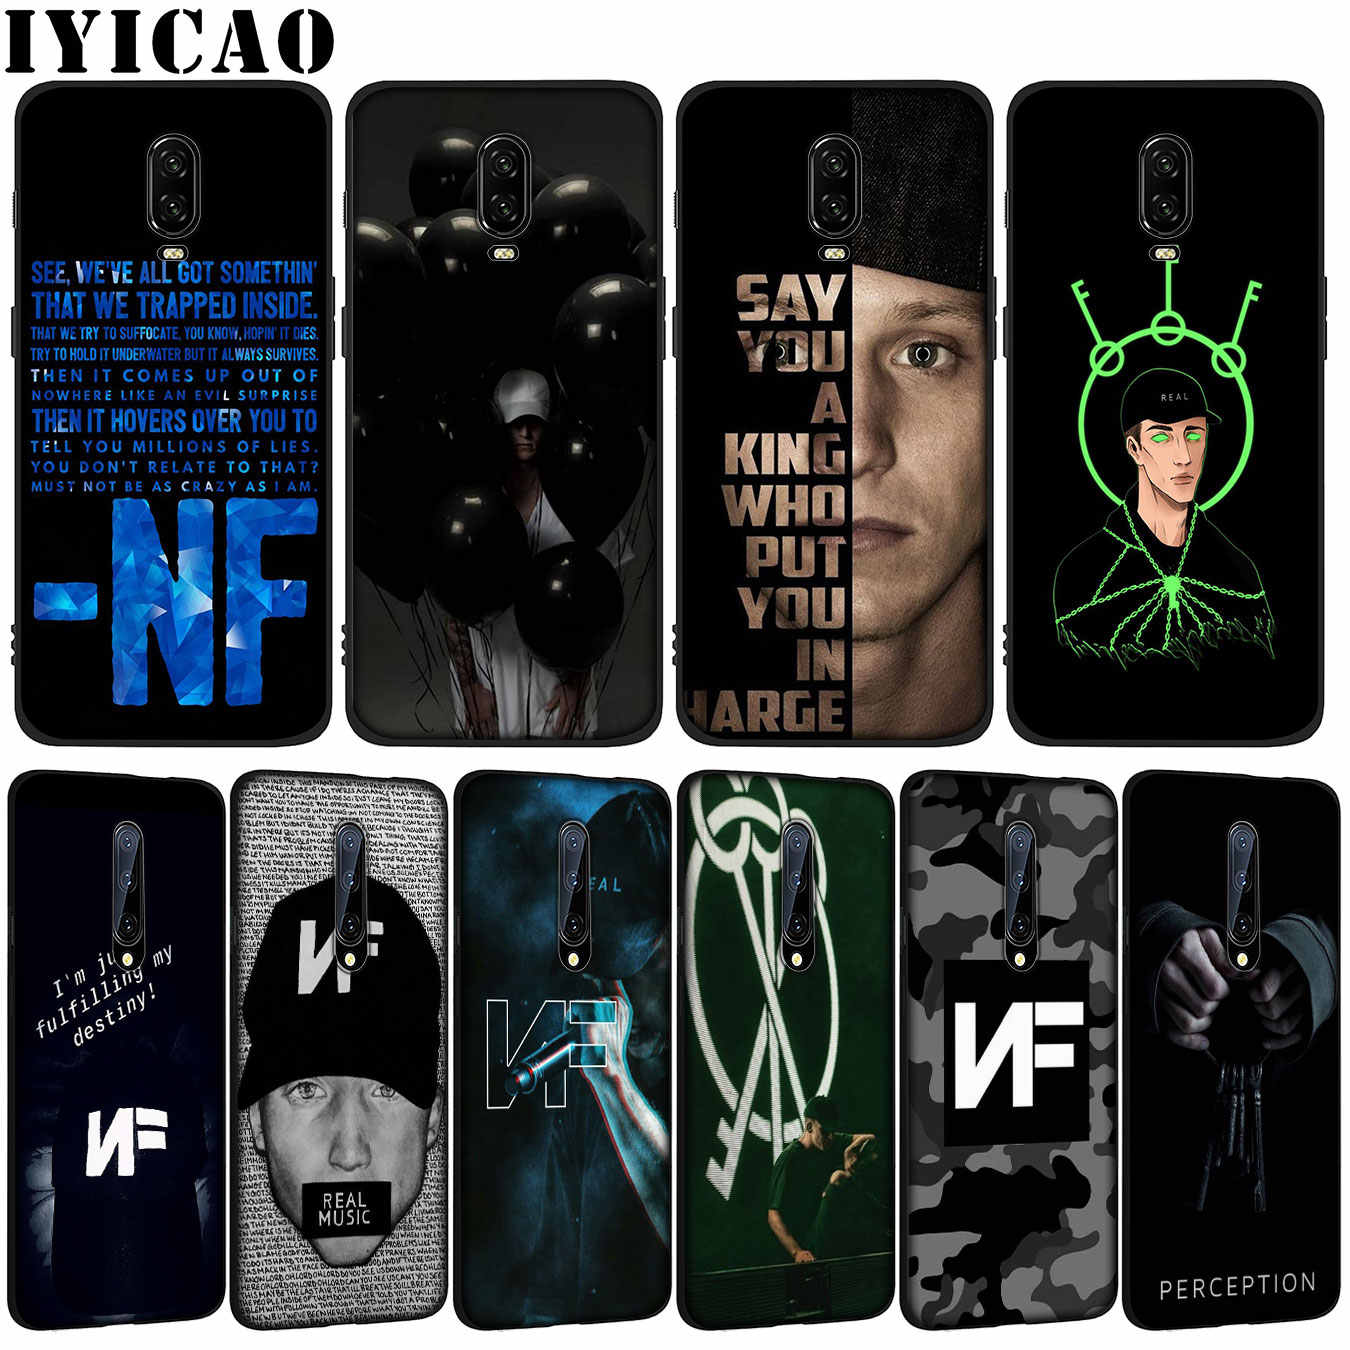 Nf Real suave TPU negro silicona teléfono caso para OnePlus 7T 7 Pro 6 6T 5 5T One Plus 7Pro cubierta